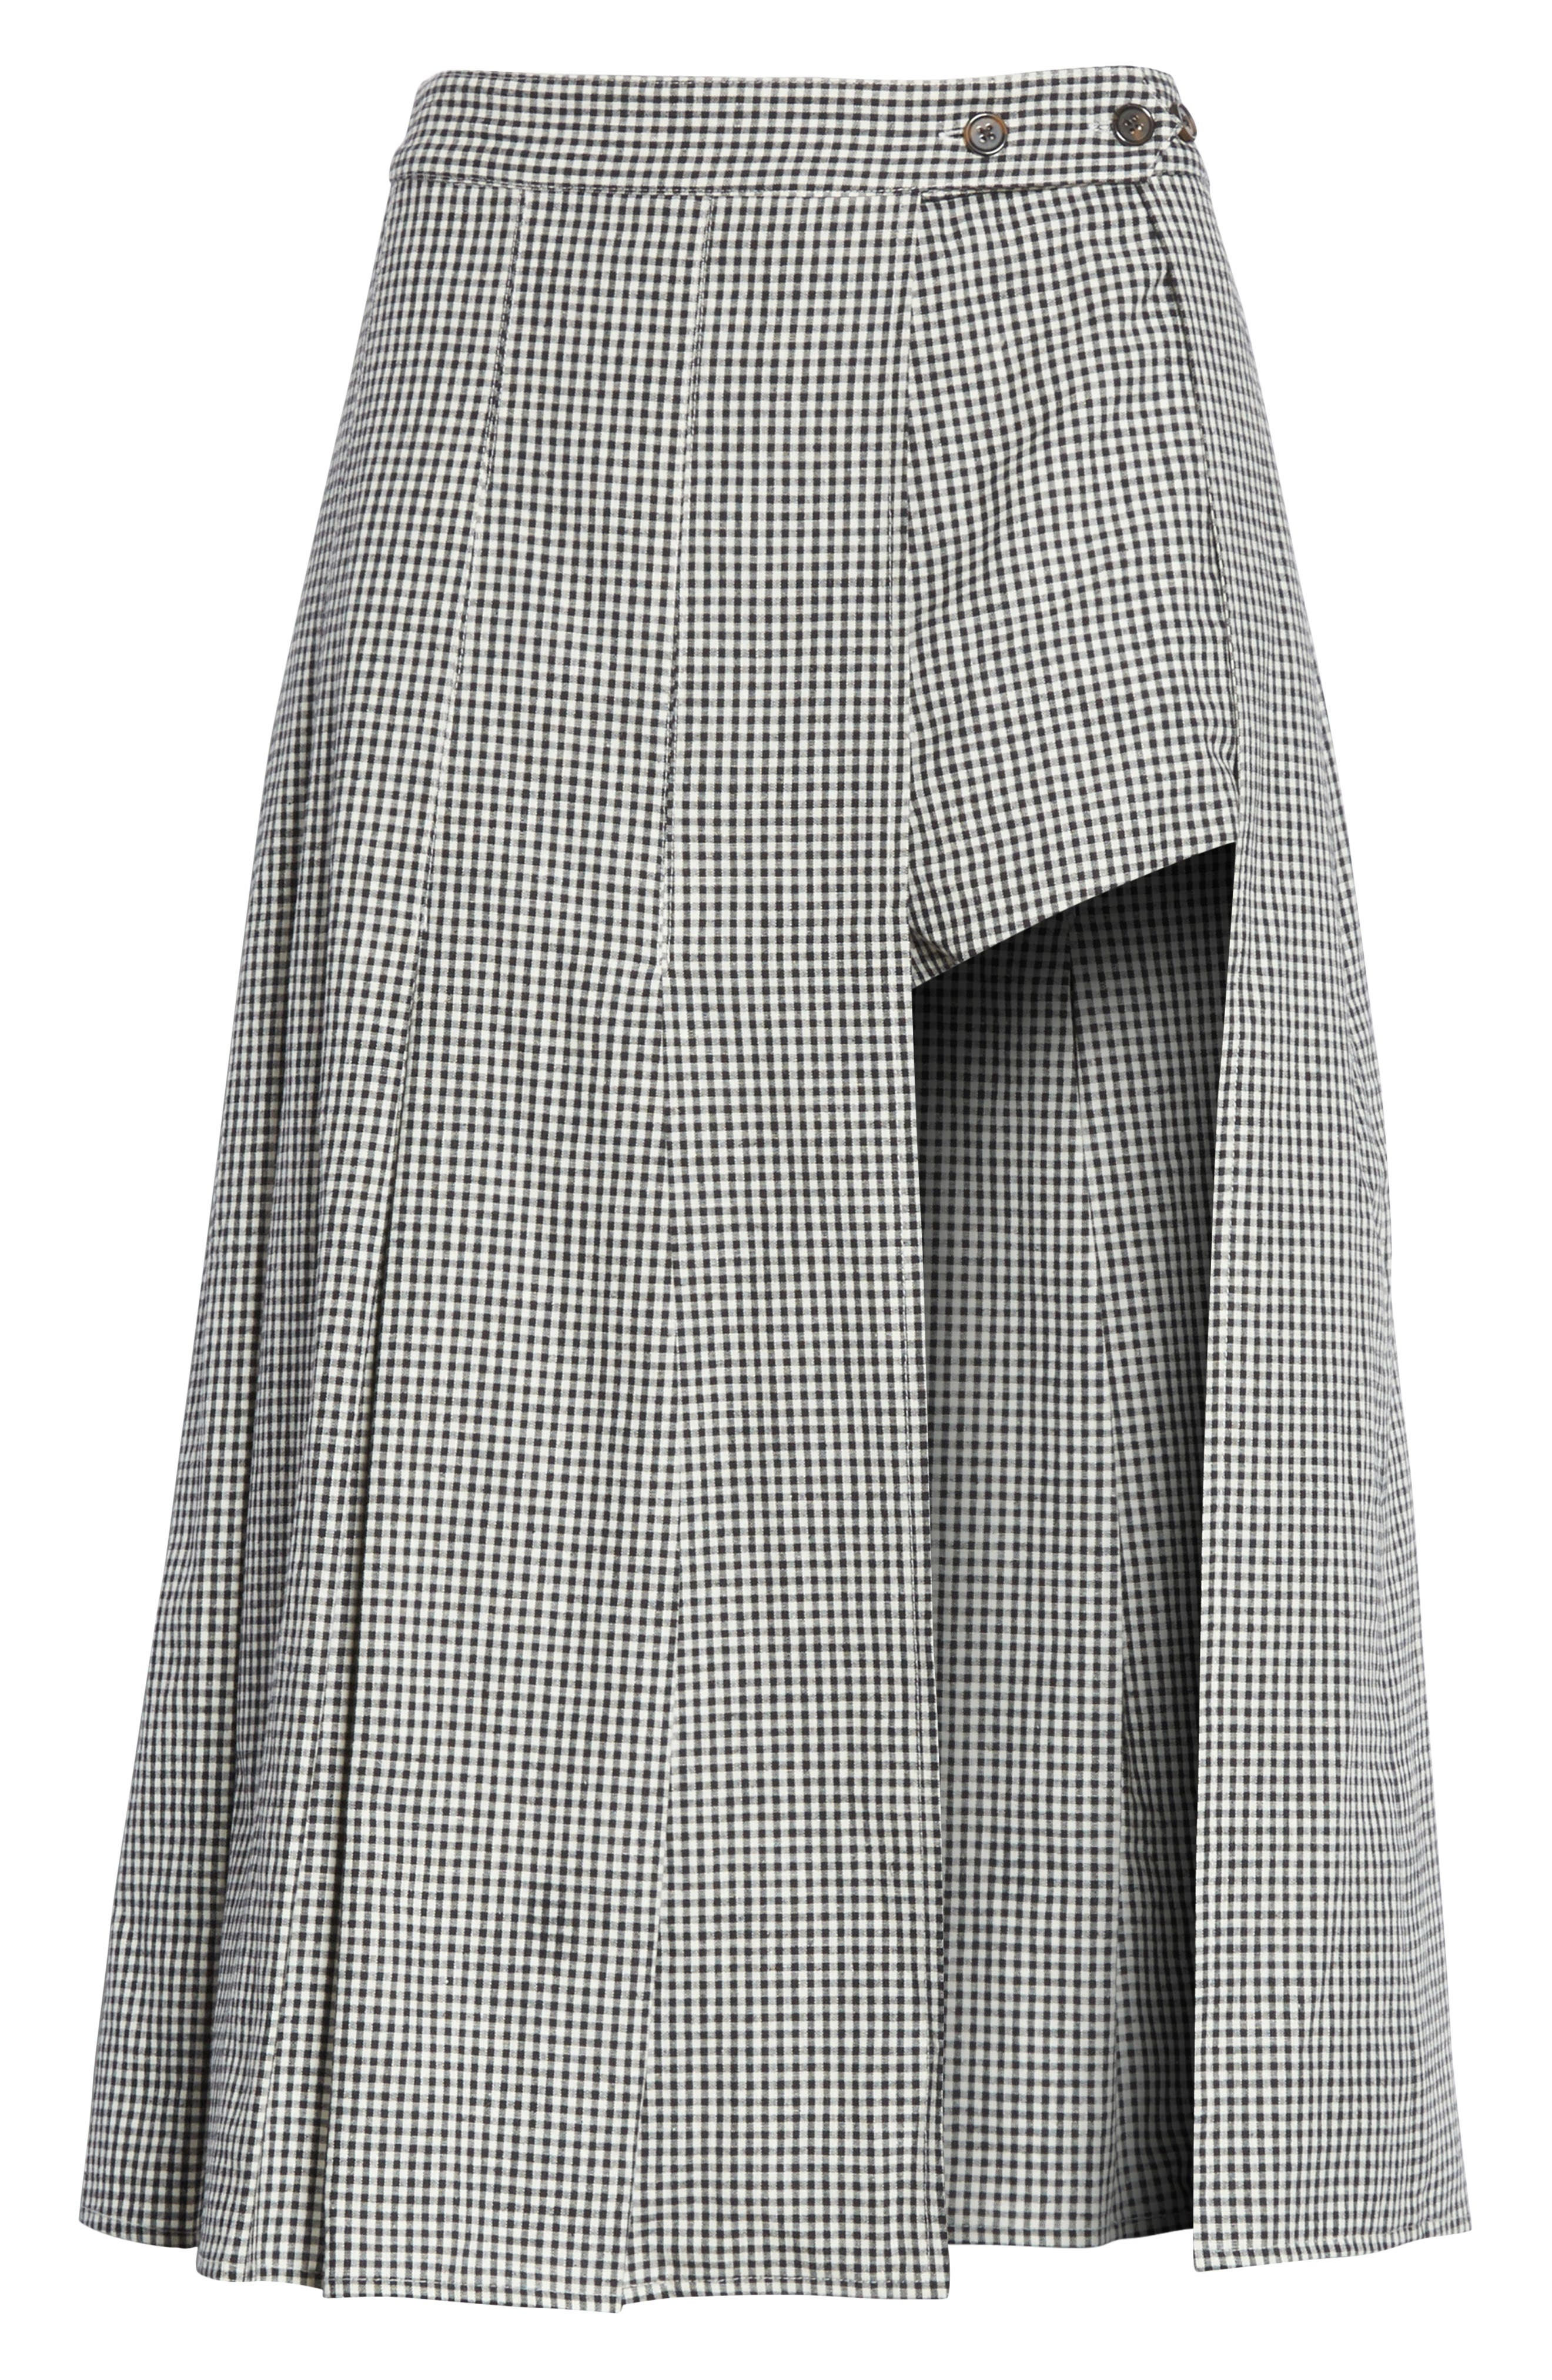 Alternate Image 6  - Sandy Liang Uniform Gingham Linen & Cotton Skirt